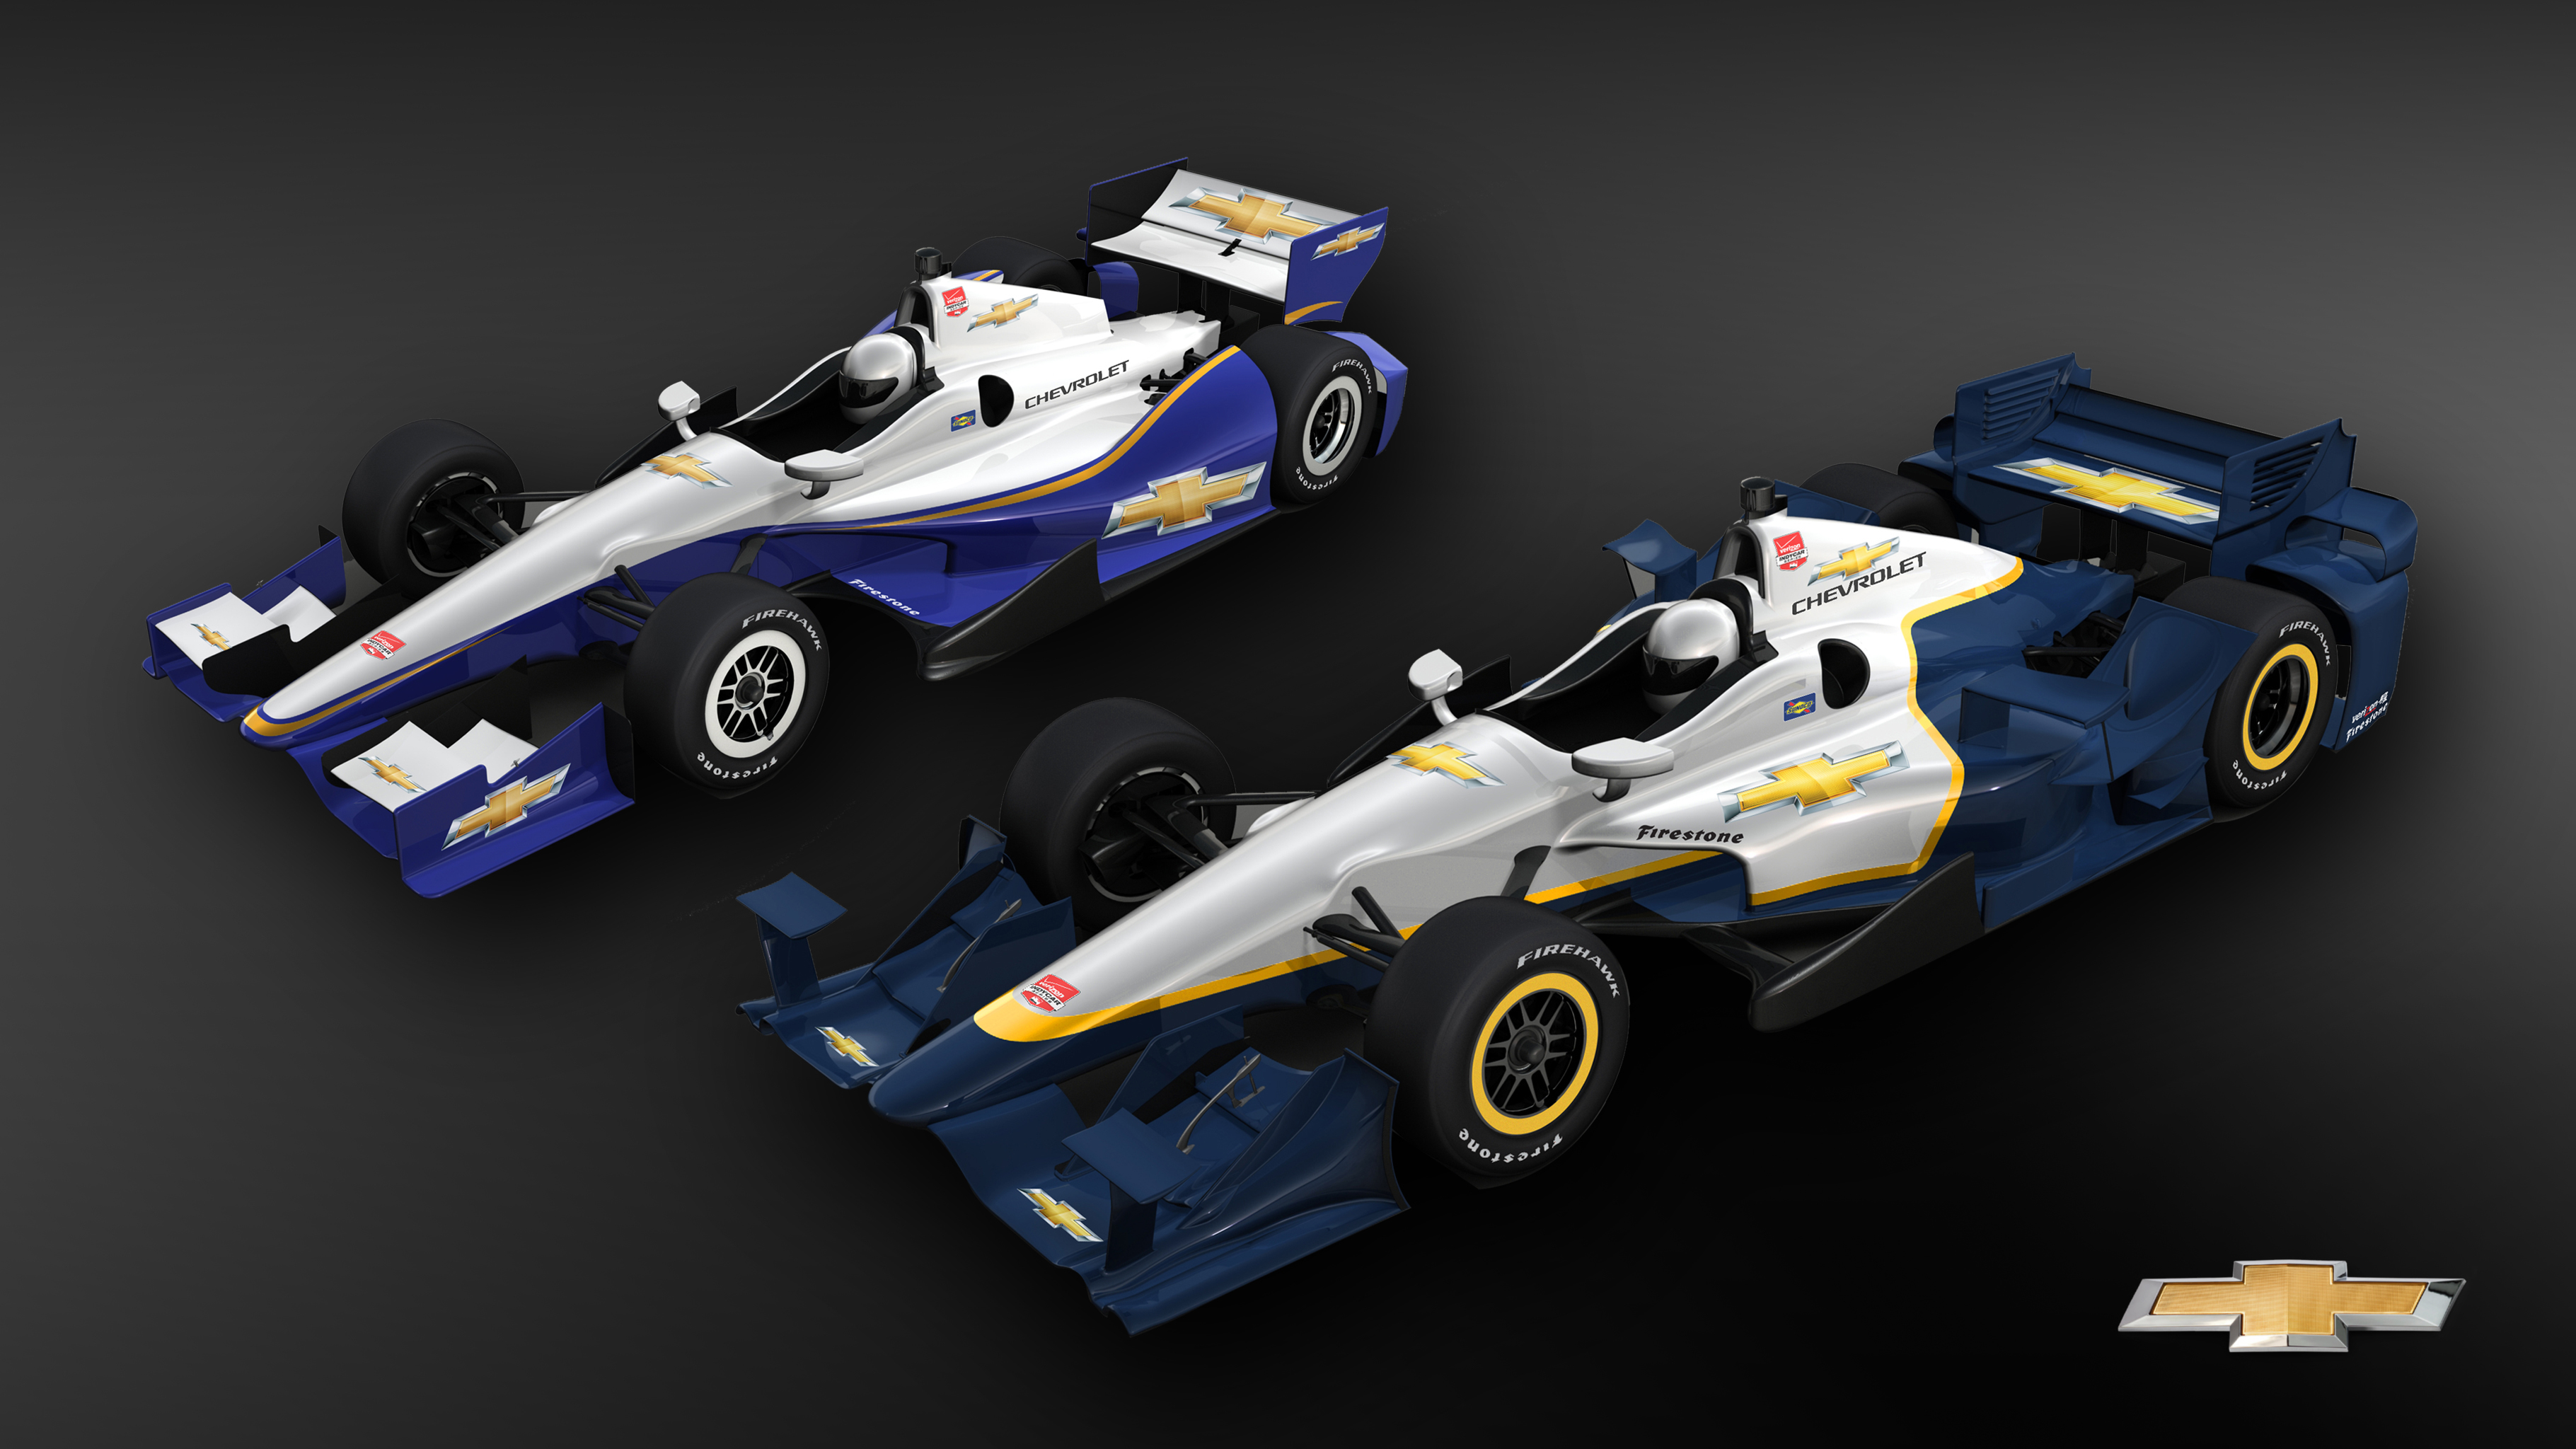 Chevrolet Reveals IndyCar Aero Kit   aero kit   racing   The Epoch Times